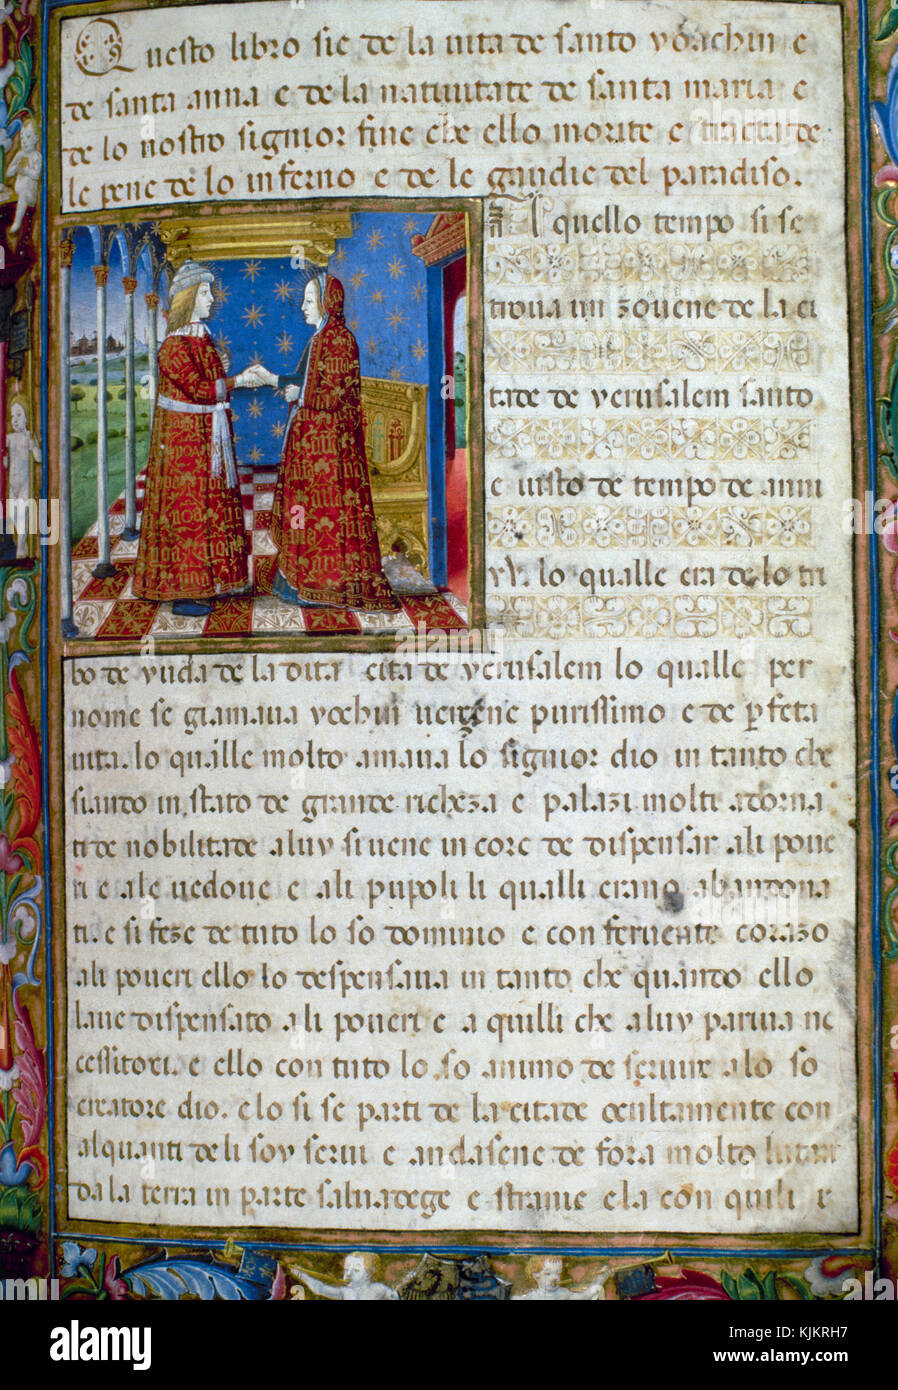 Codex De Predis. First illuminated page. The sponsors of the volume, the Duke Galeazzo Maria Sforza and his wife, - Stock Image